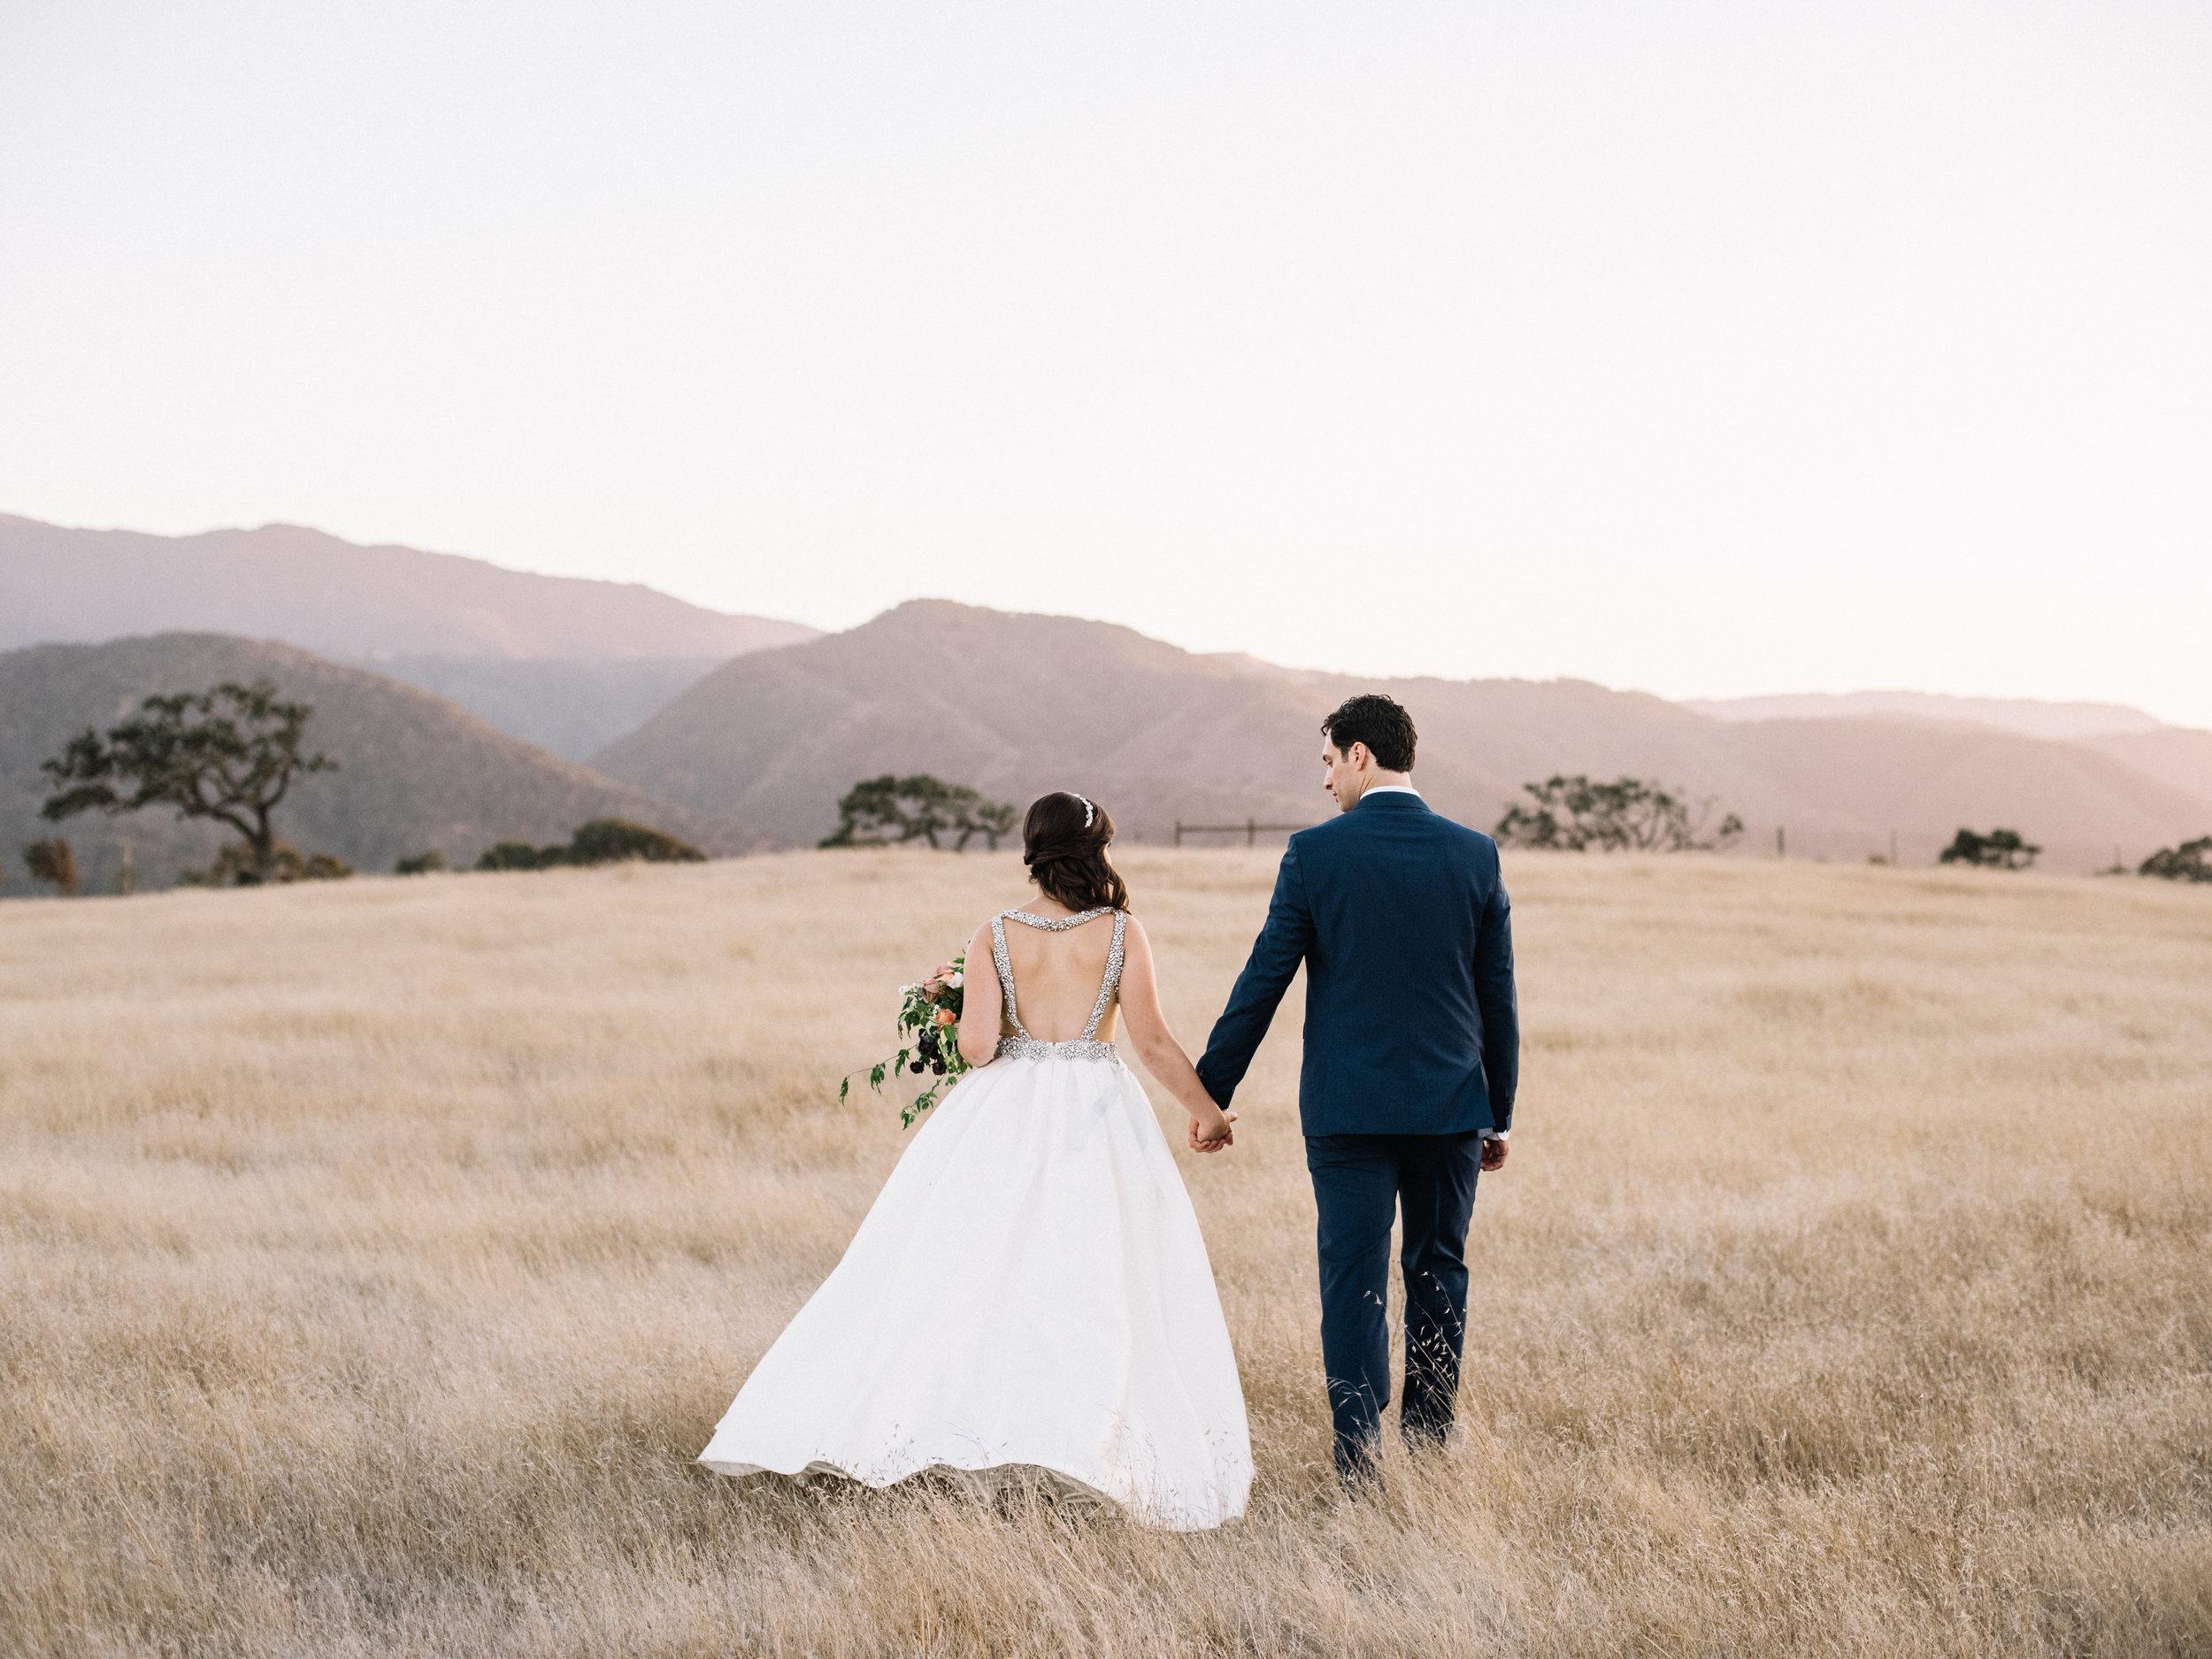 santa-barbara-elopement-elope-wedding-planner-planning-coordinator-day-of-intimate-event-design-kestrel-park-santa-ynez-english-country-estate-garden-castle (20).jpg